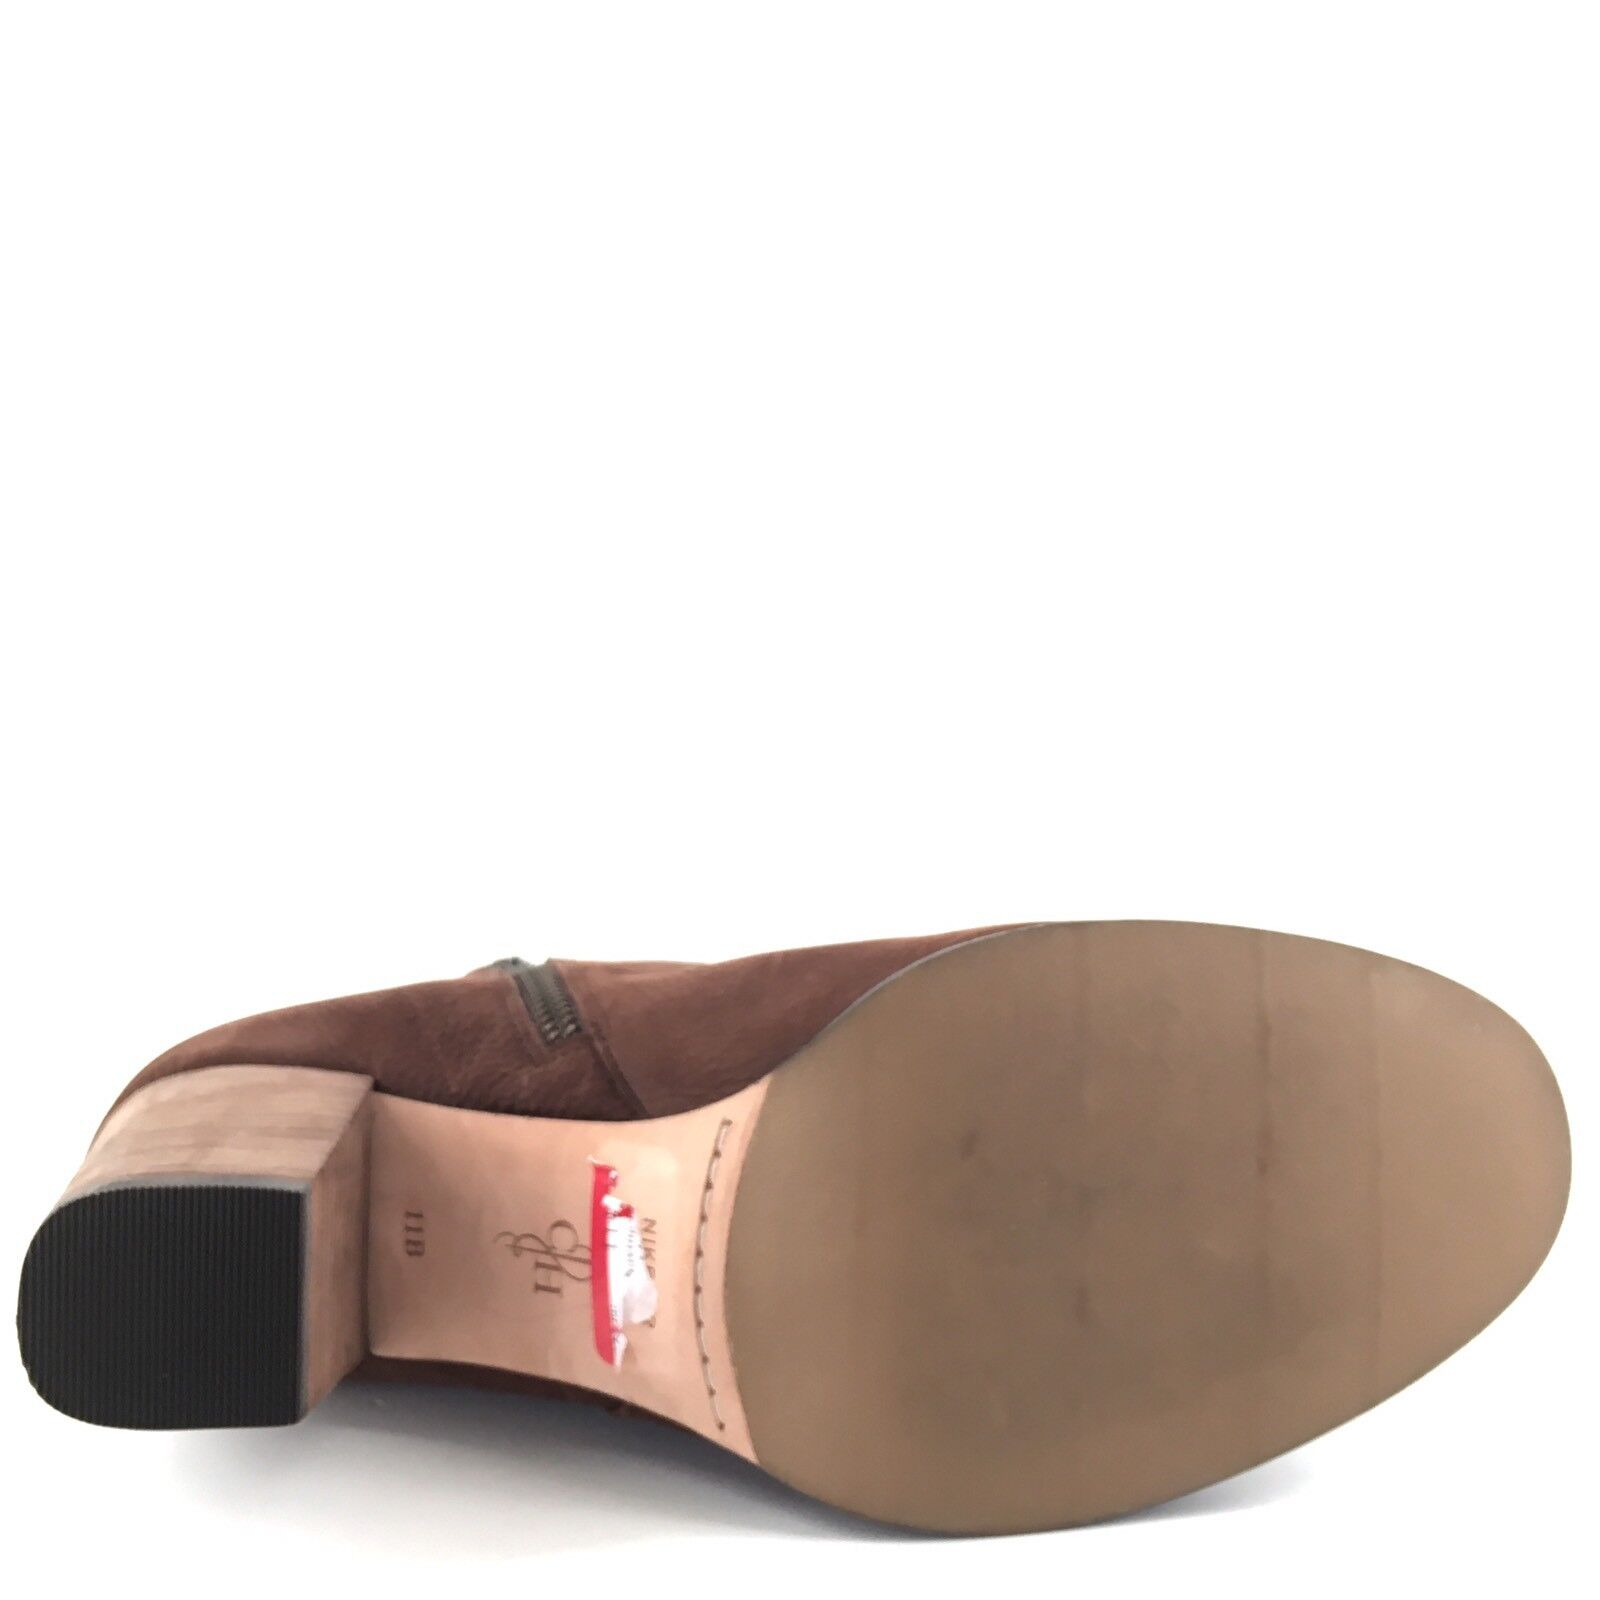 New Cole Leder Haan Cassidy ROTwood Braun Leder Cole Ankle Stiefel Damenschuhe Größe 11 M 278 1cb2b0